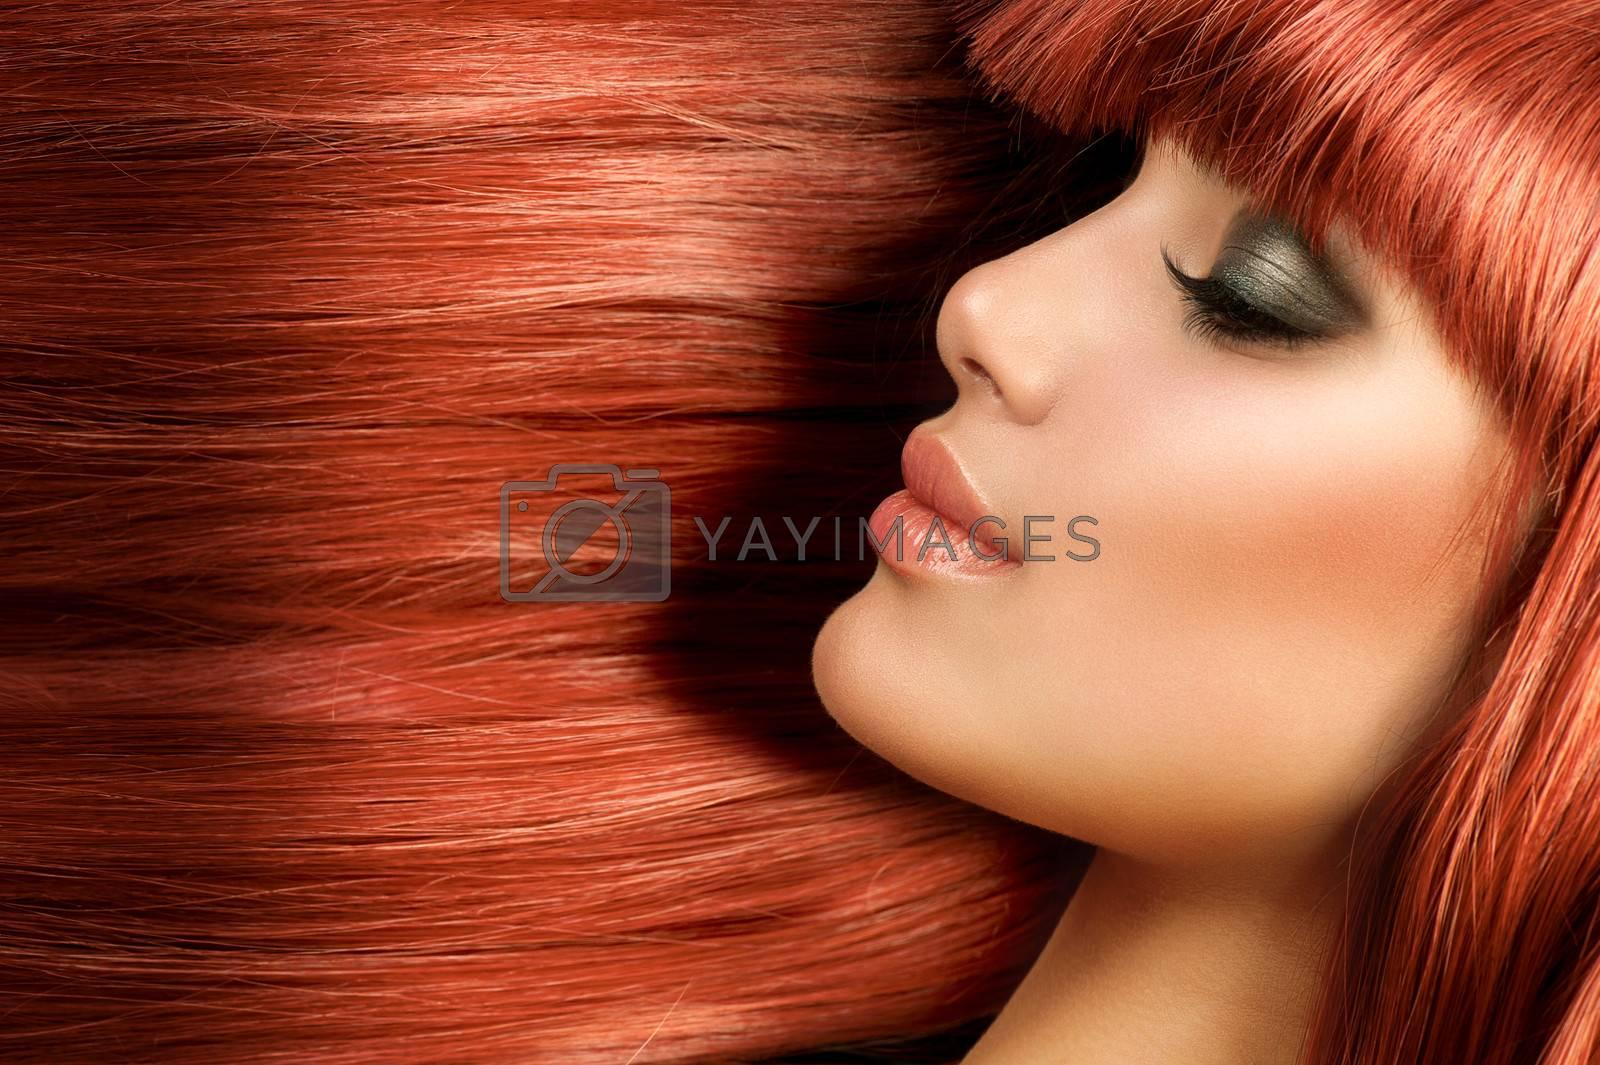 Healthy Long Straight Hair. Red Hair Model Girl Portrait